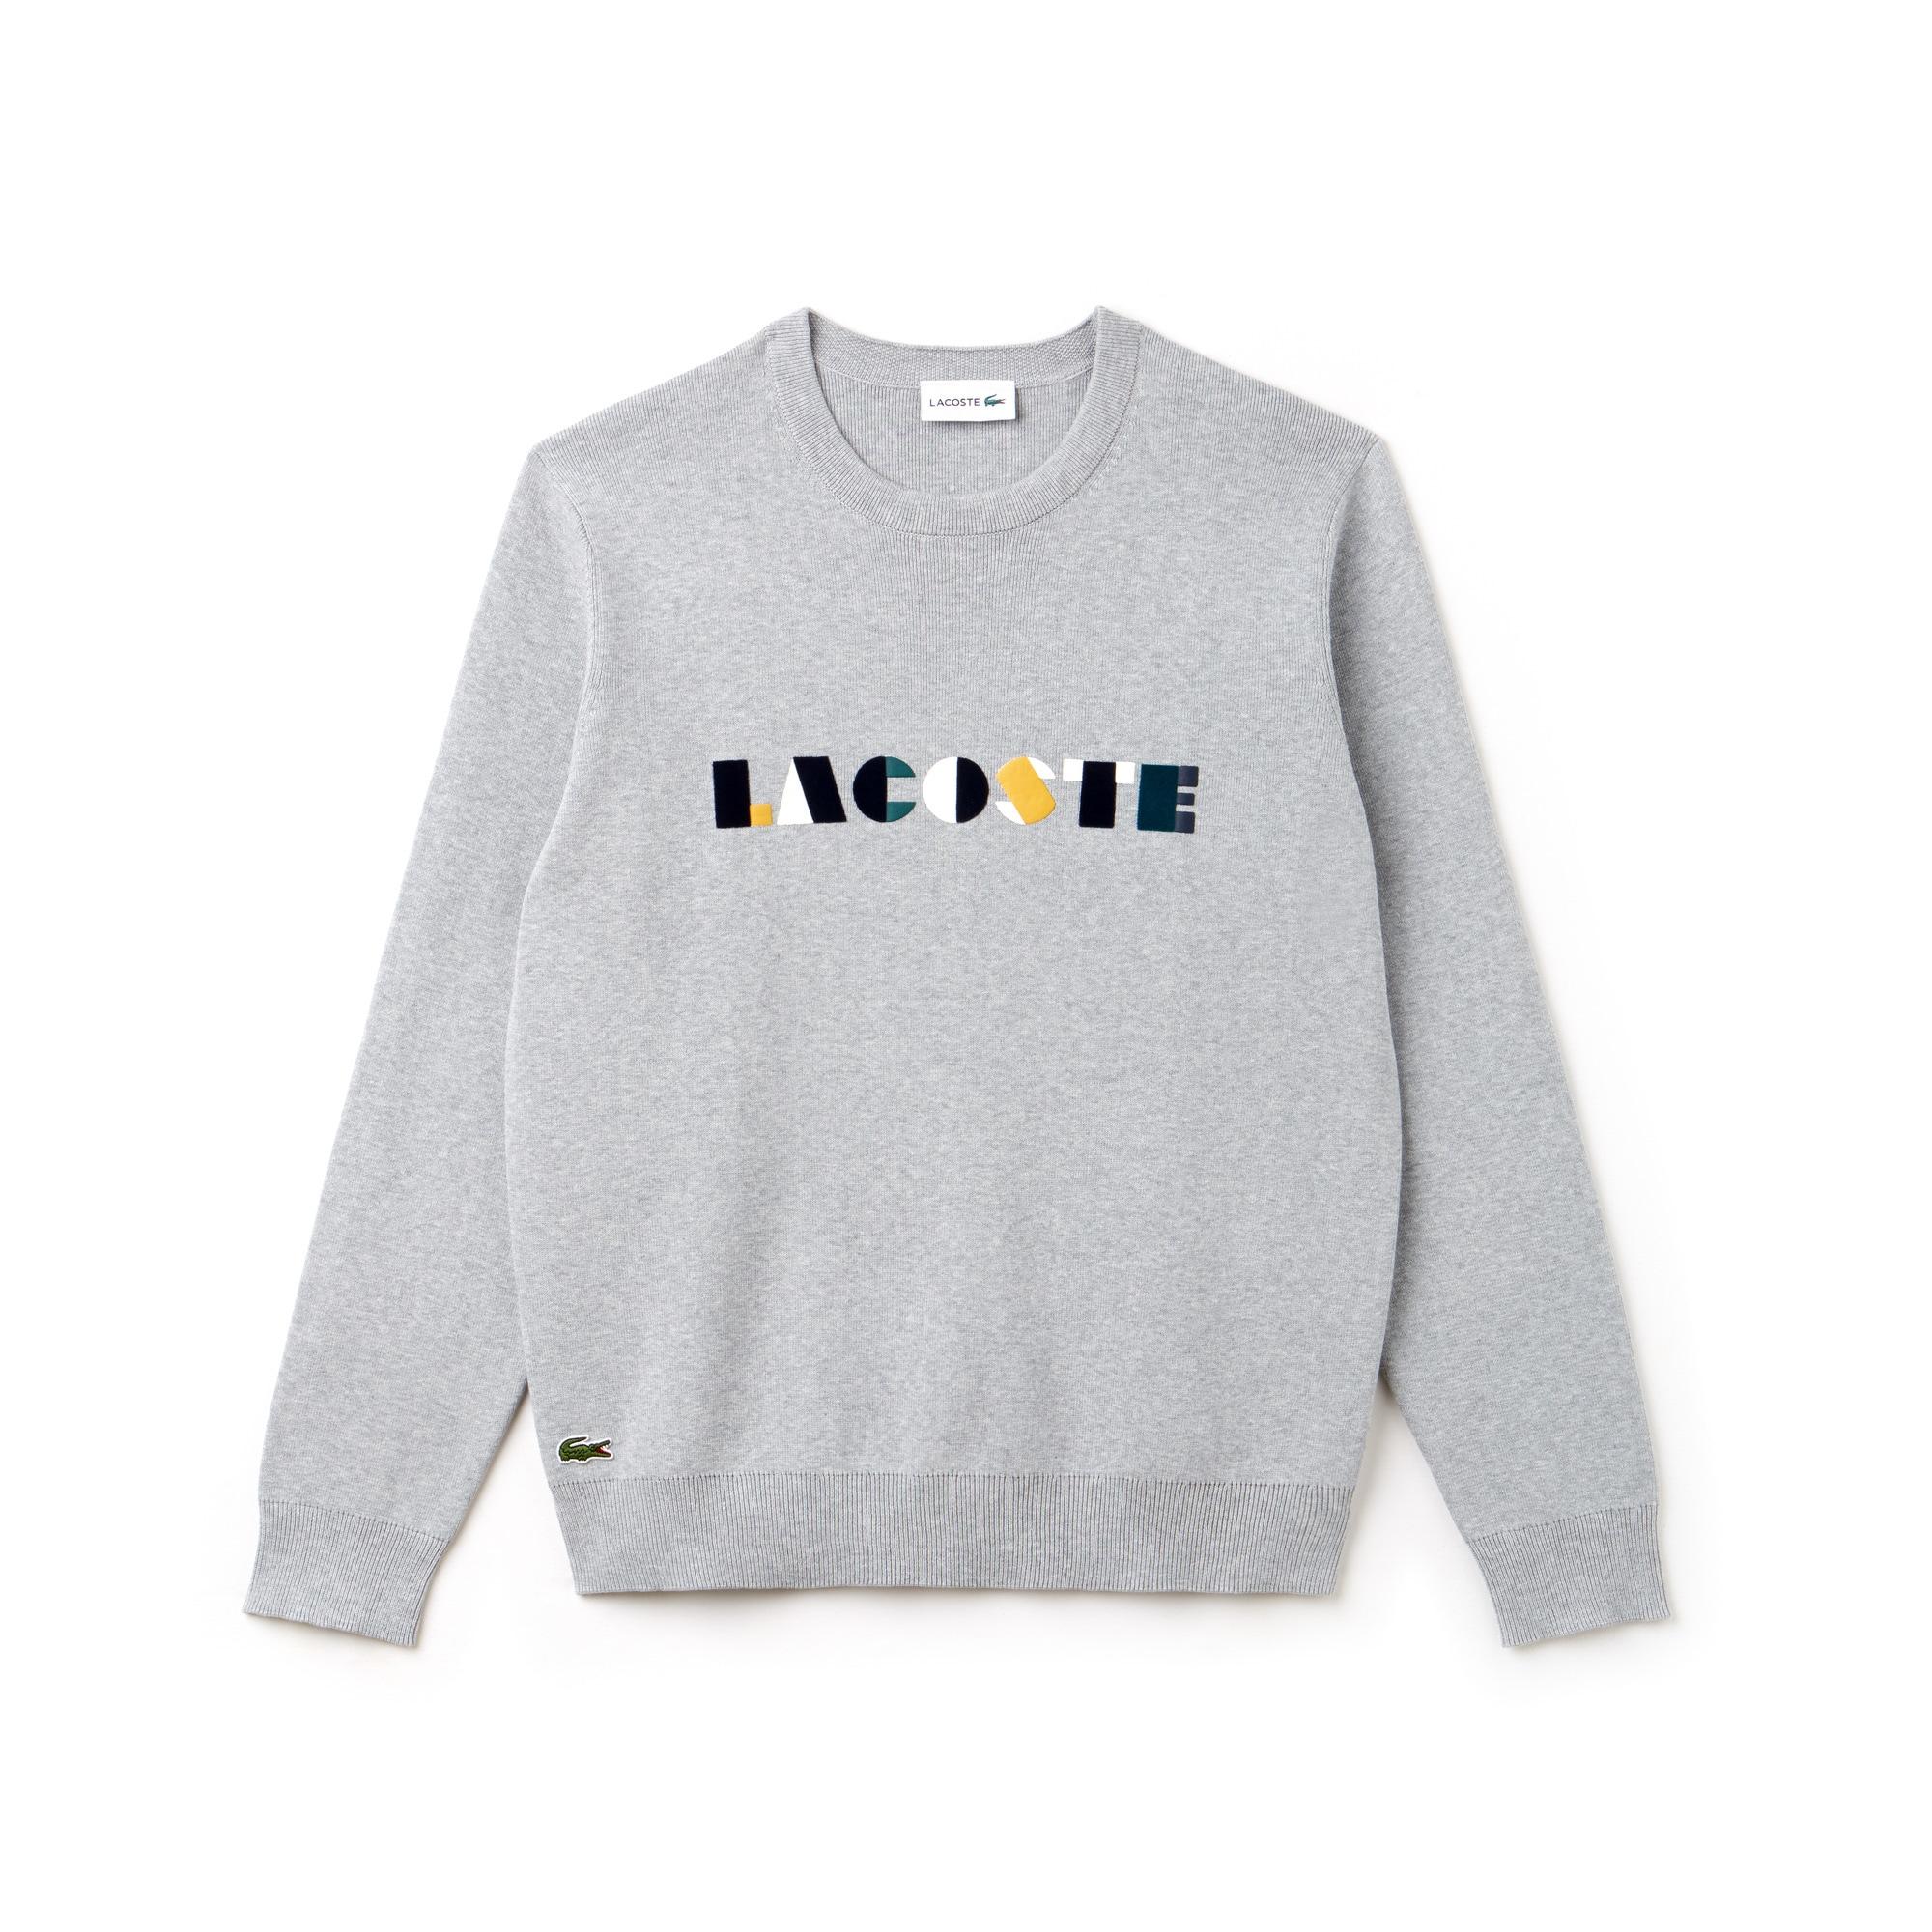 Men's Crew Neck Lacoste Lettering Ribbed Pima Cotton Sweater